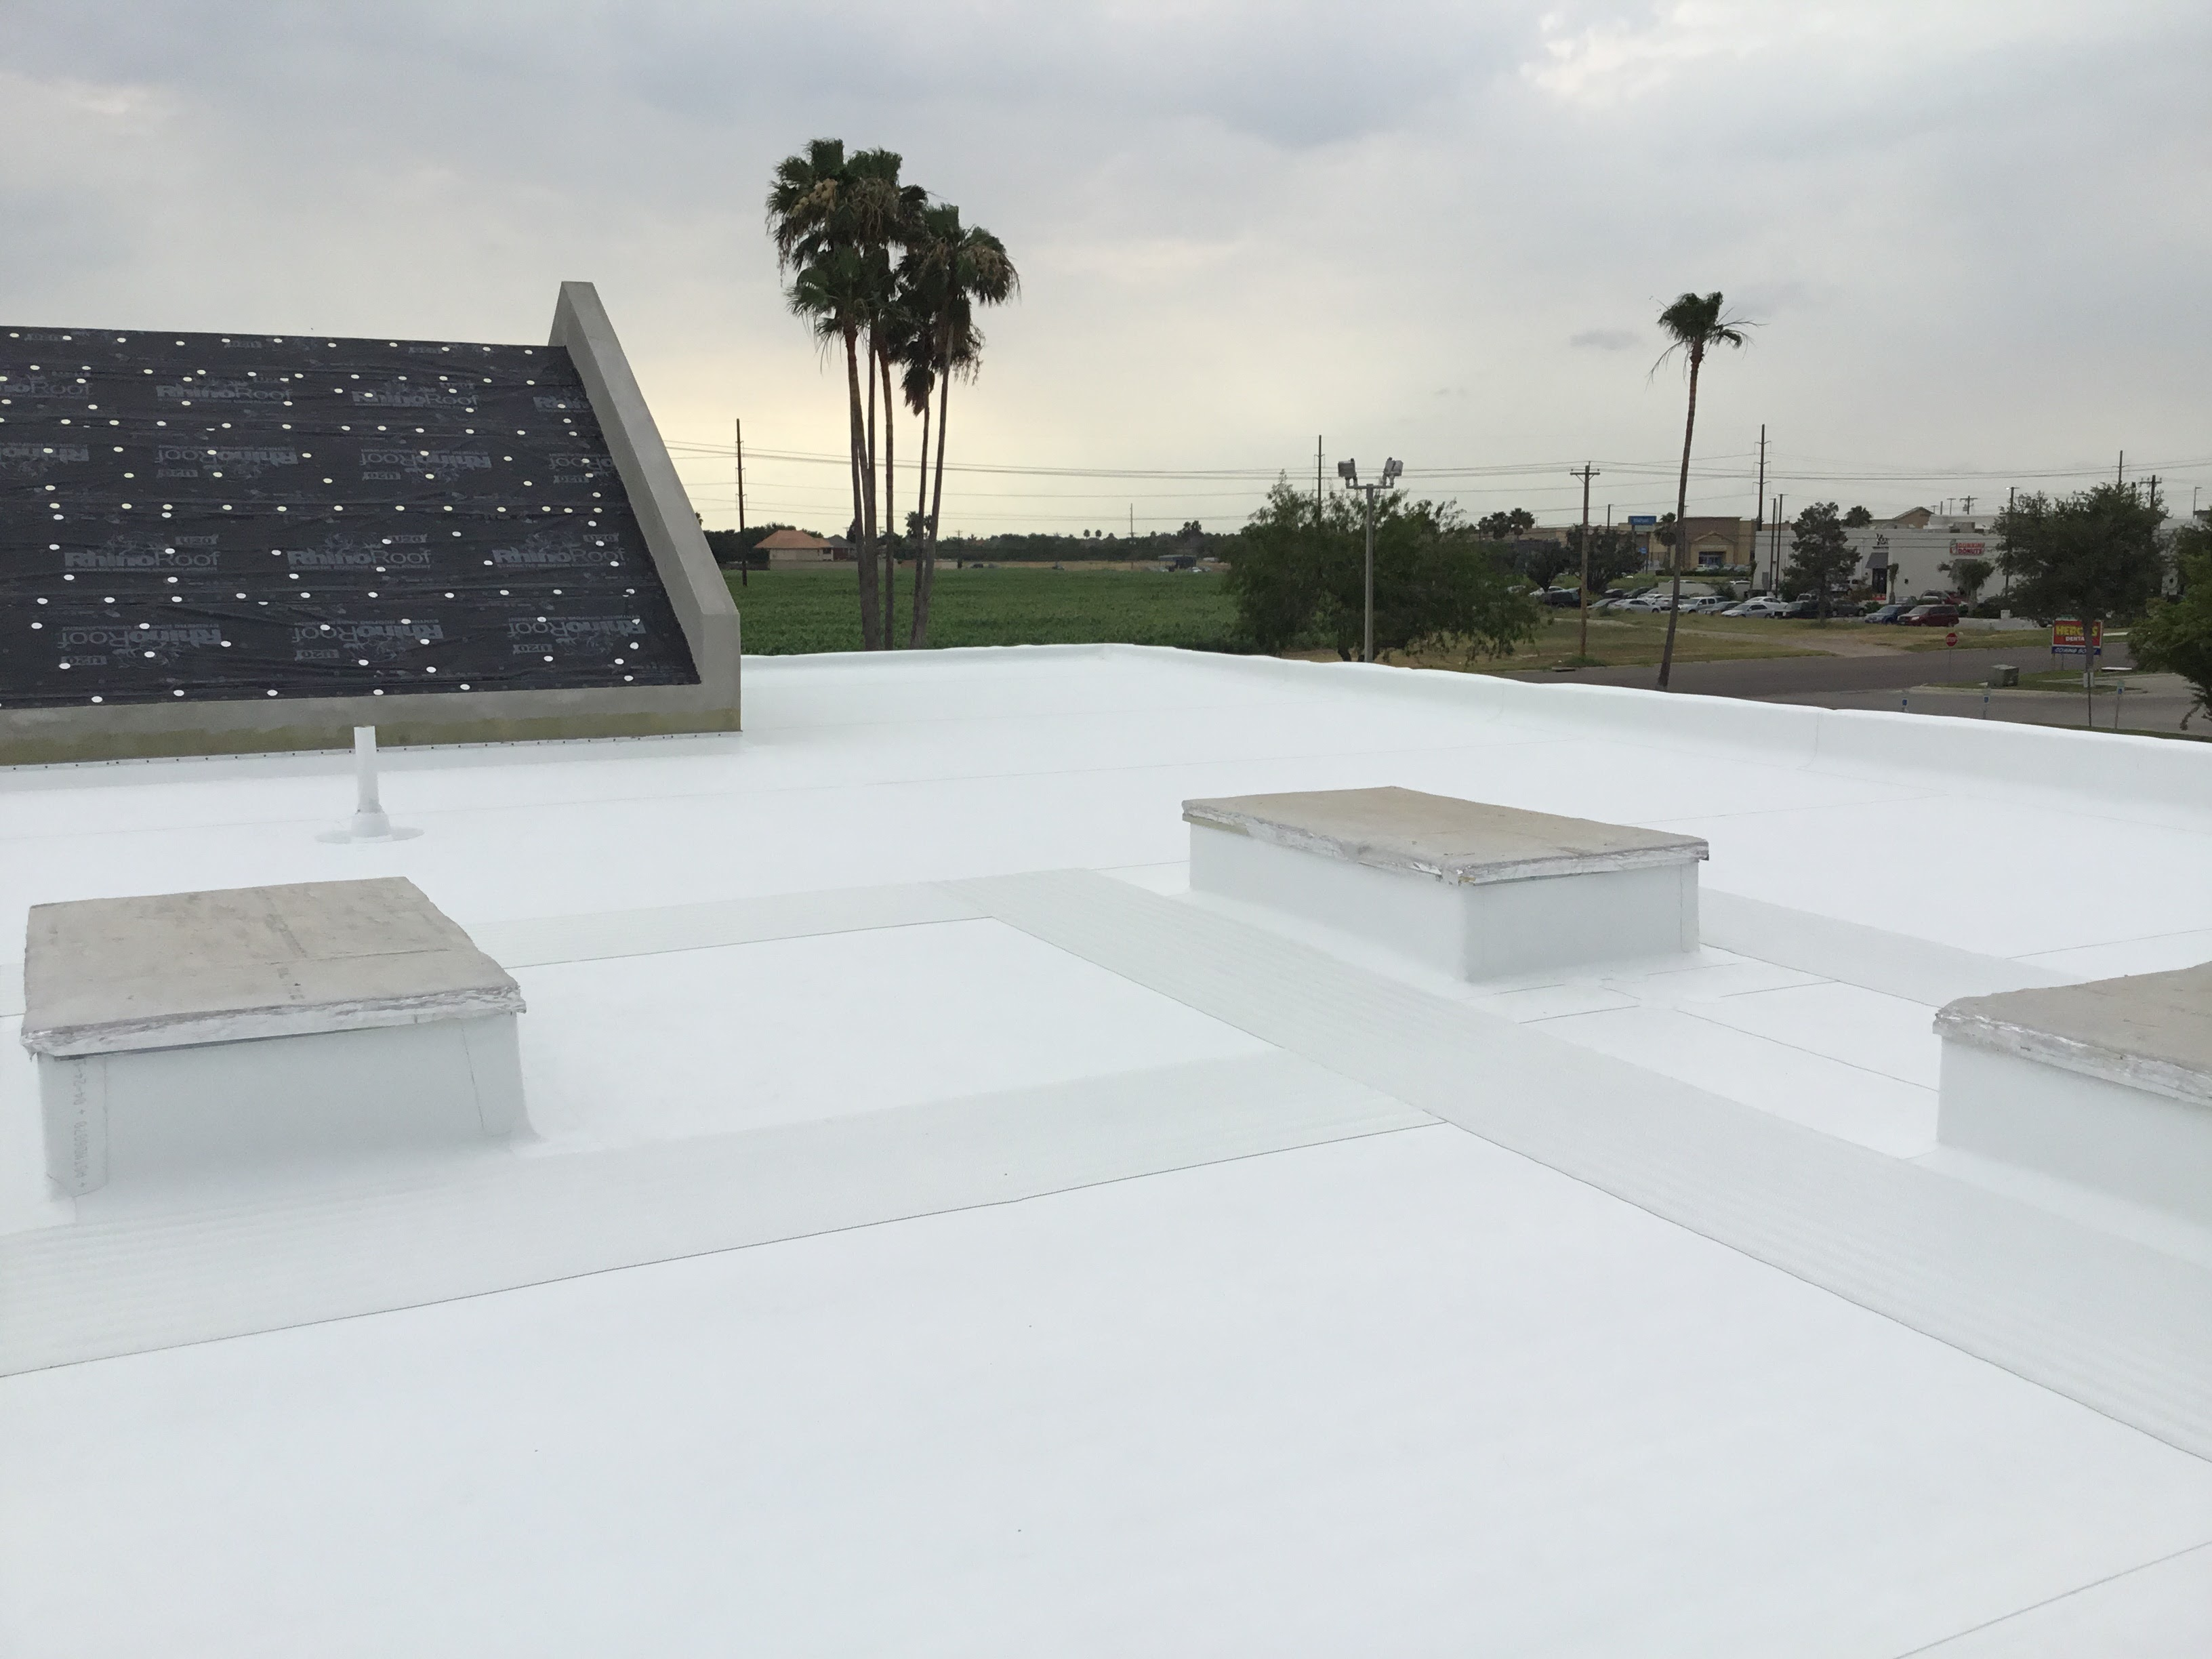 Galleries Castro Roofing